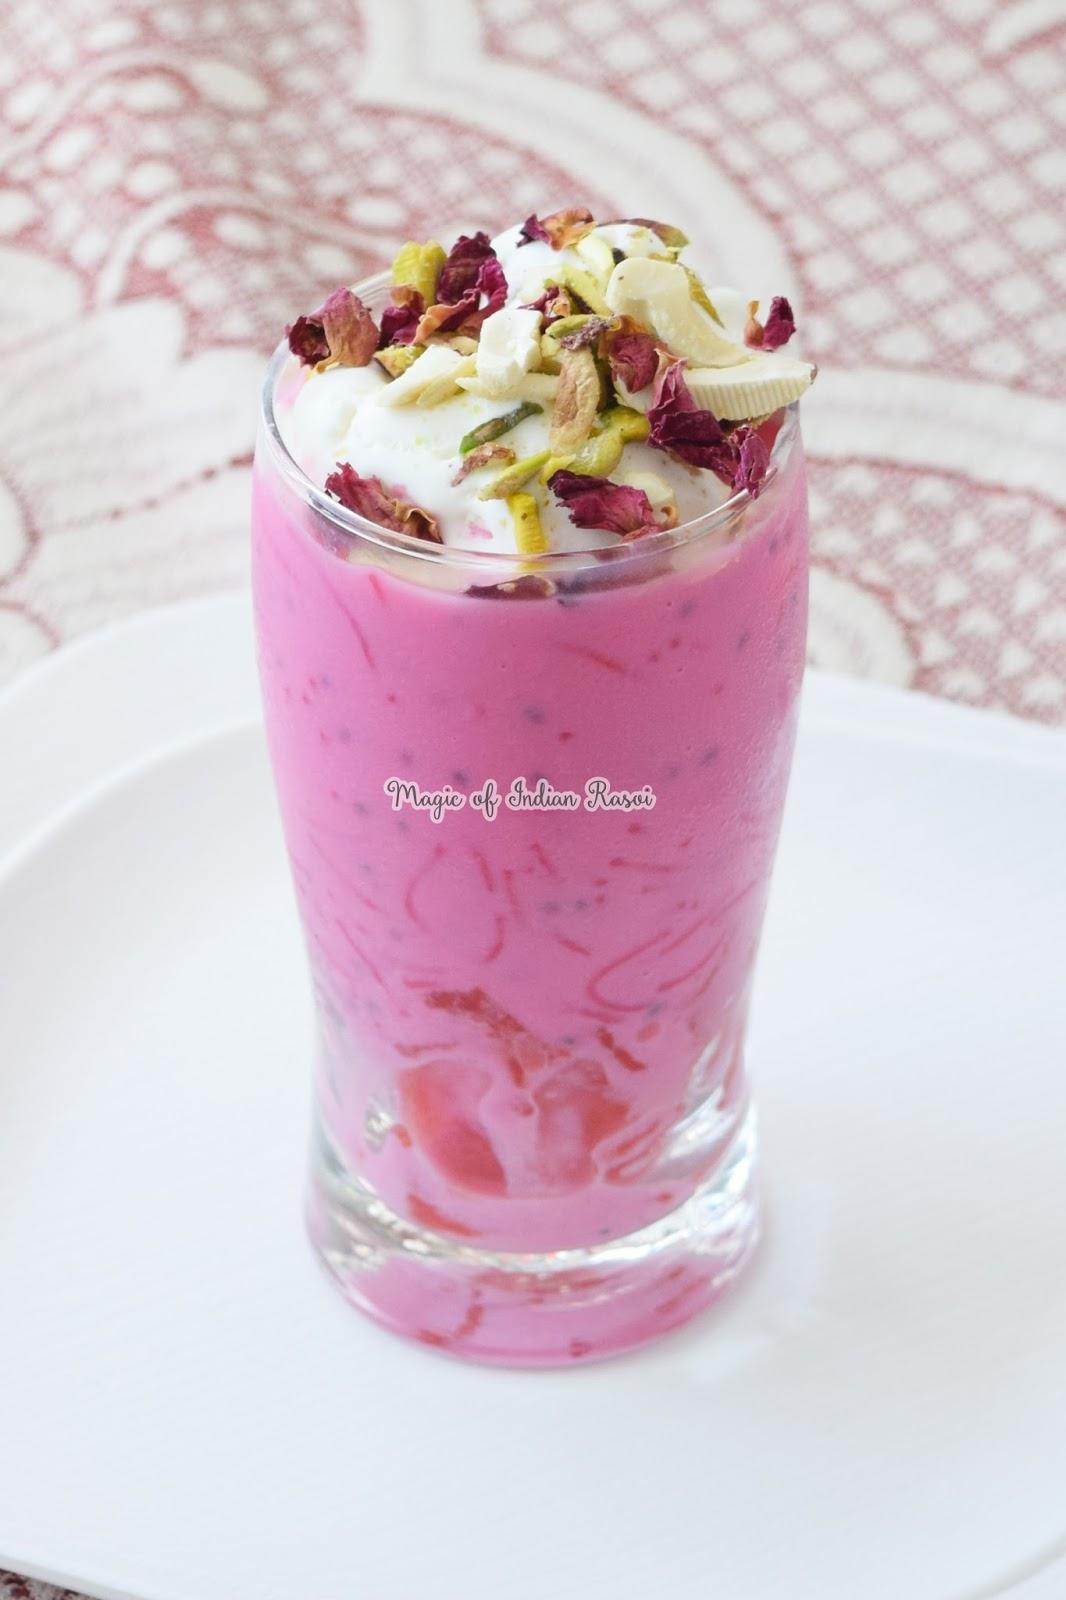 Instant Falooda Mix - Rose Falooda Mix - इंस्टेंट फालूदा मिक्स - रोज़ फालूदा मिक्स रेसिपी - Priya R - Magic of Indian Rasoi